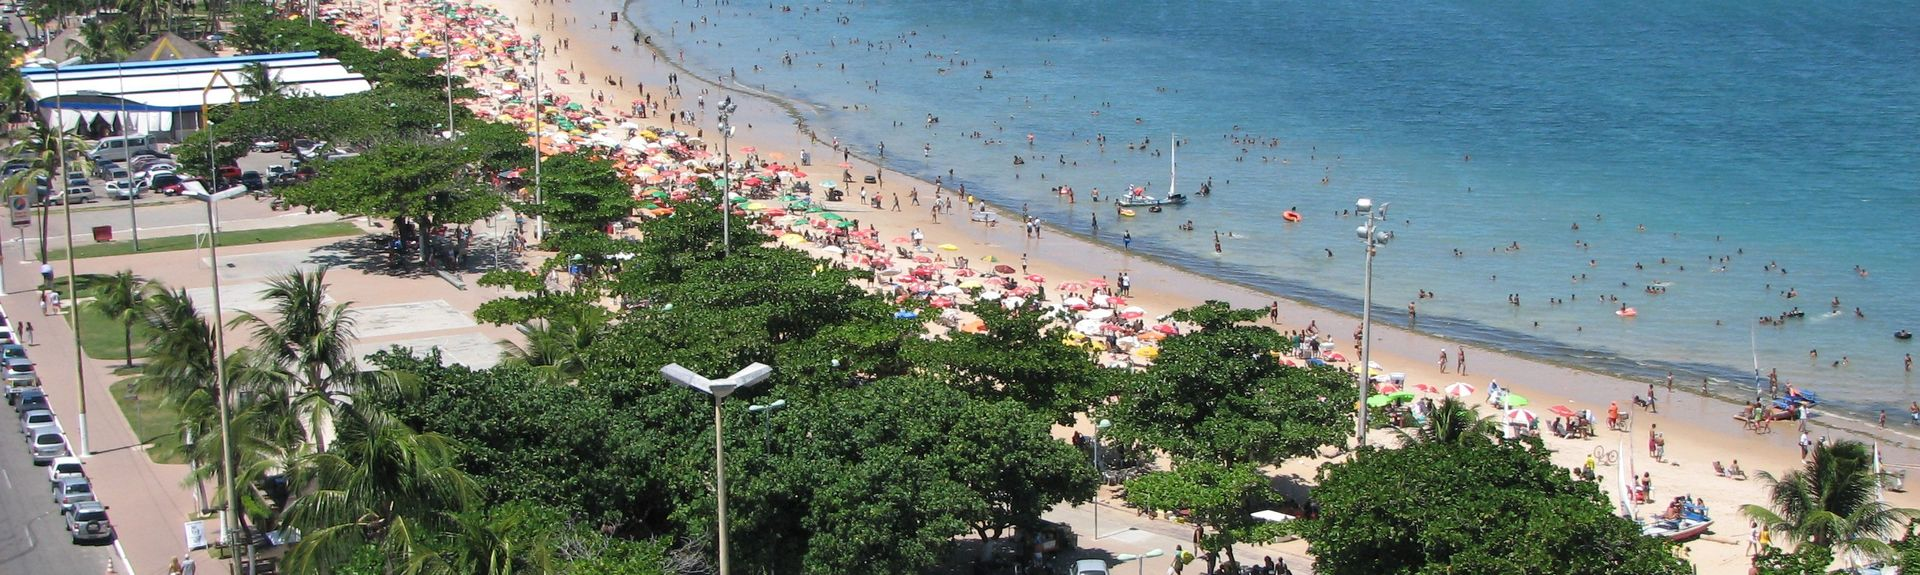 Ponta Verde, Maceió, Alagoas, Brasilien